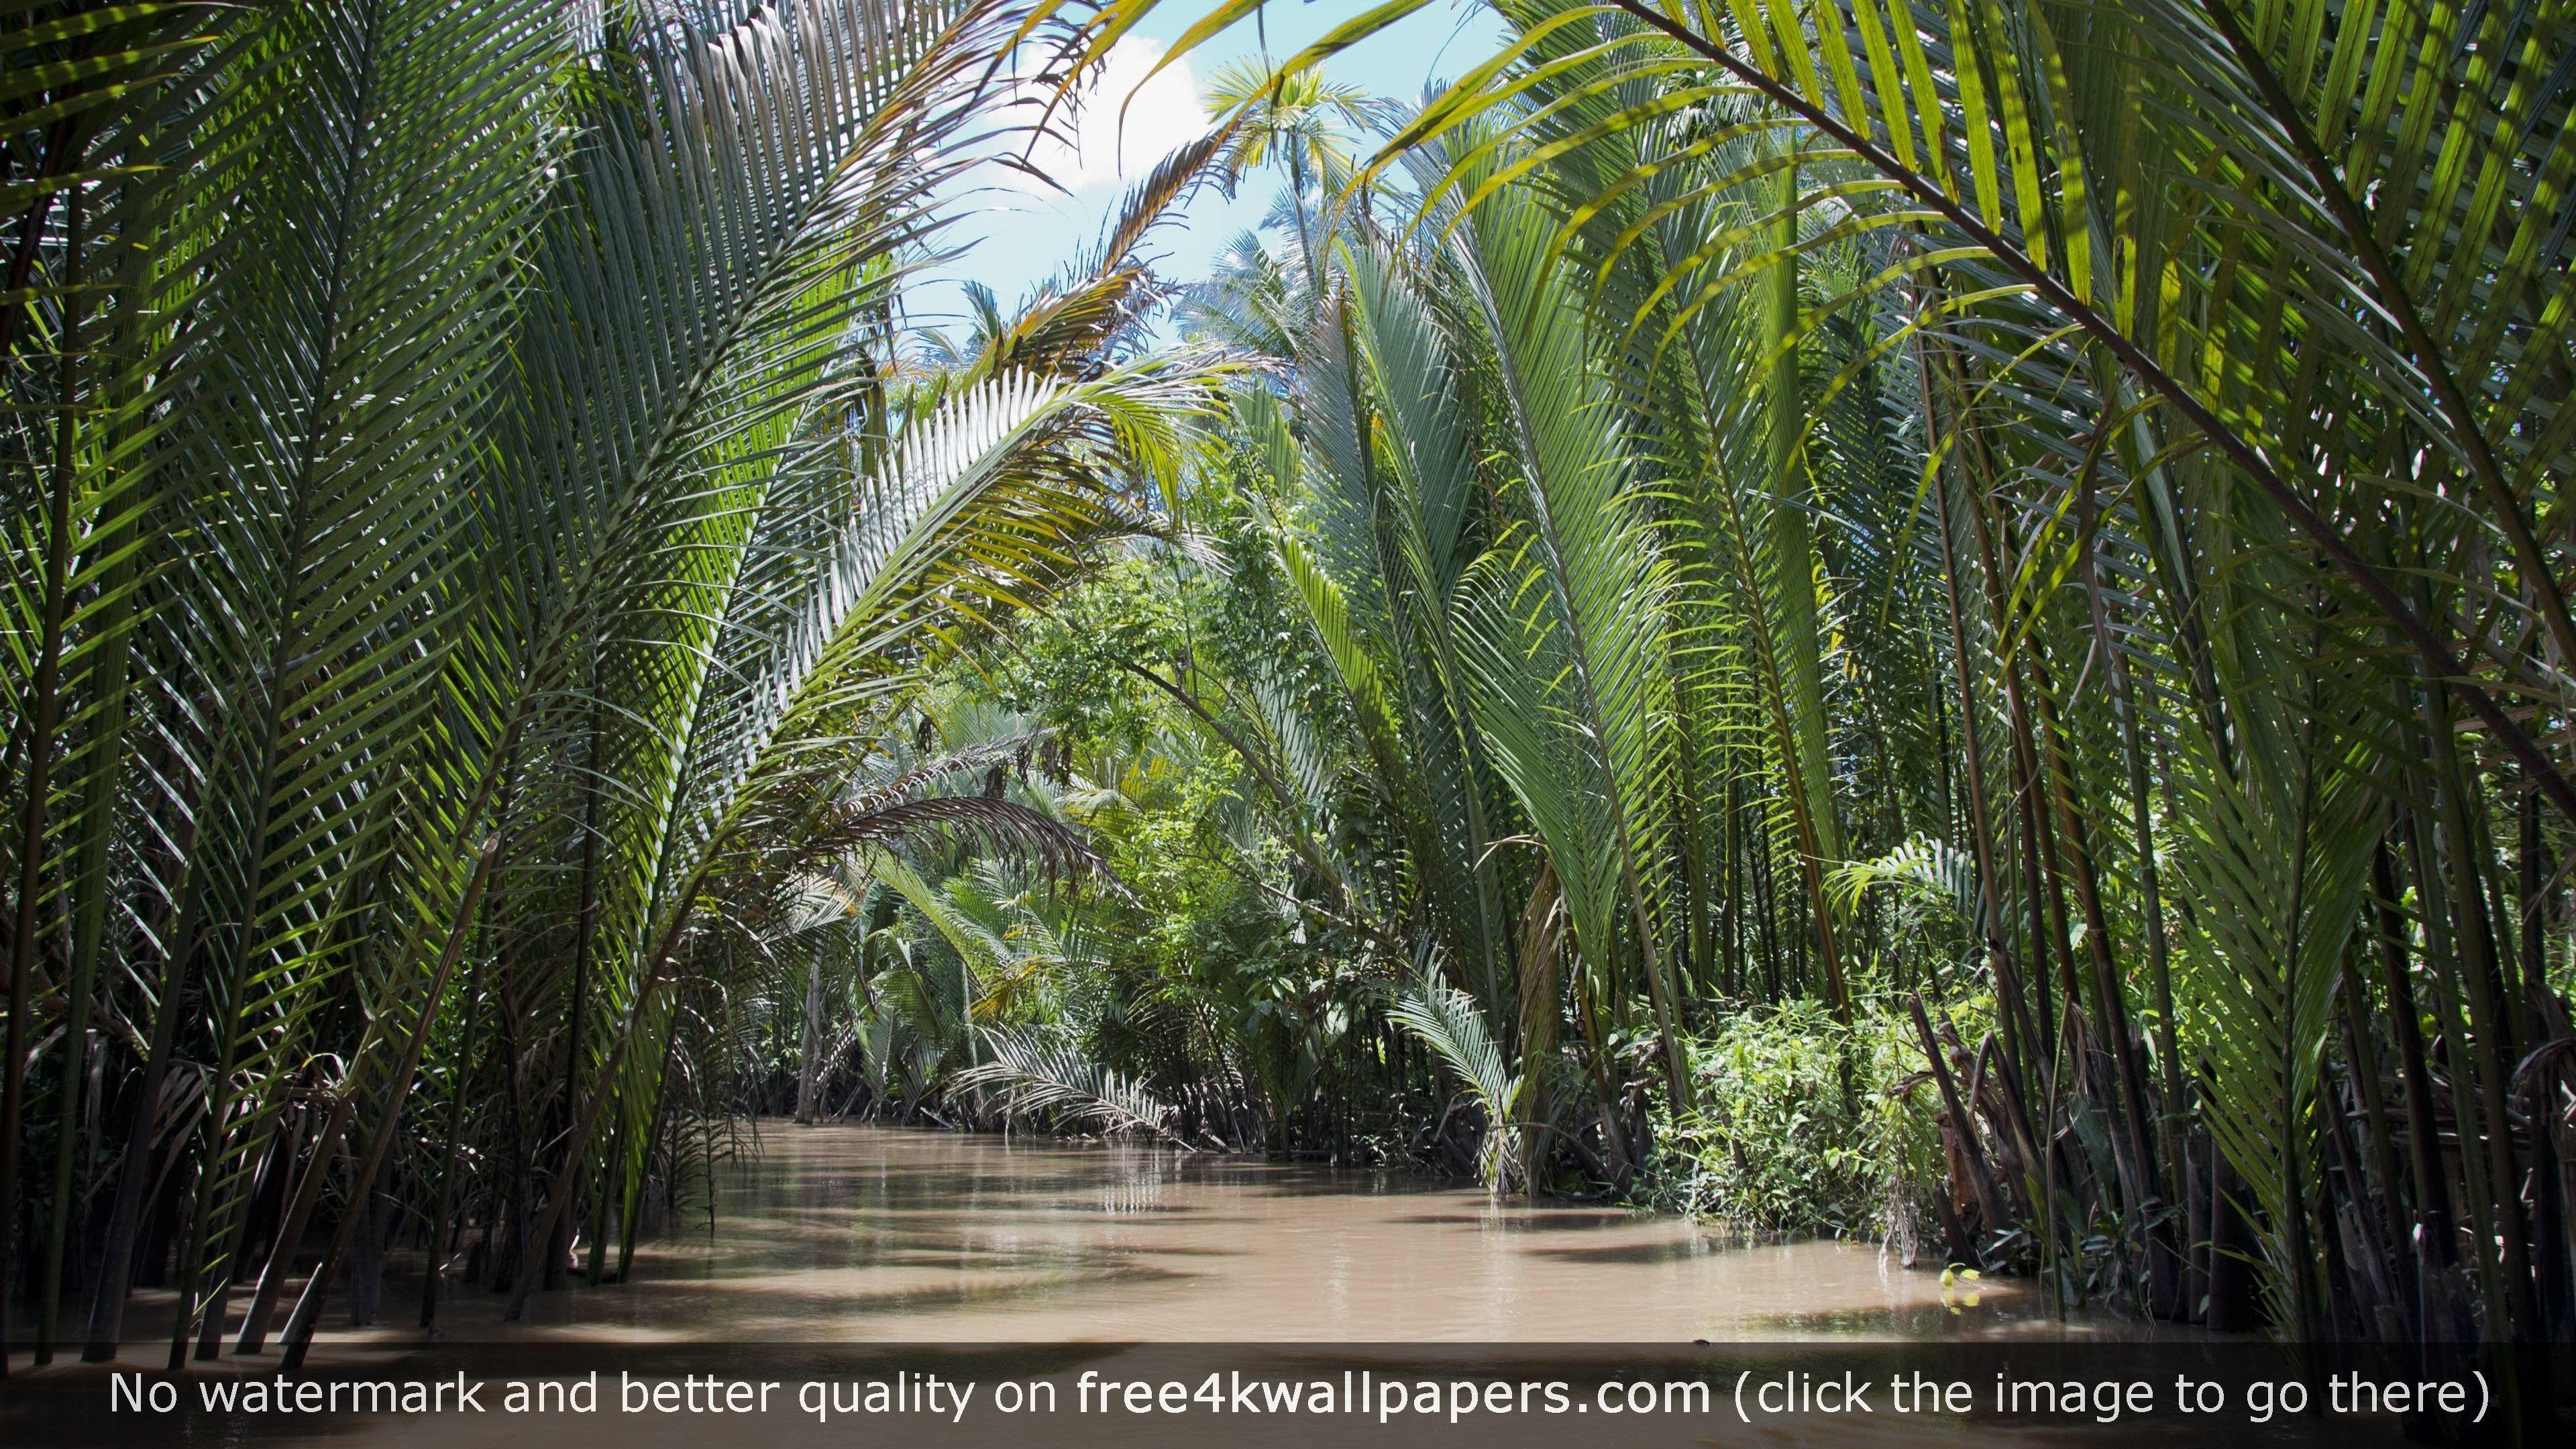 Mekong river vietnam wallpaper httpsfree4kwallpapers mekong river vietnam 4k wallpaper voltagebd Images